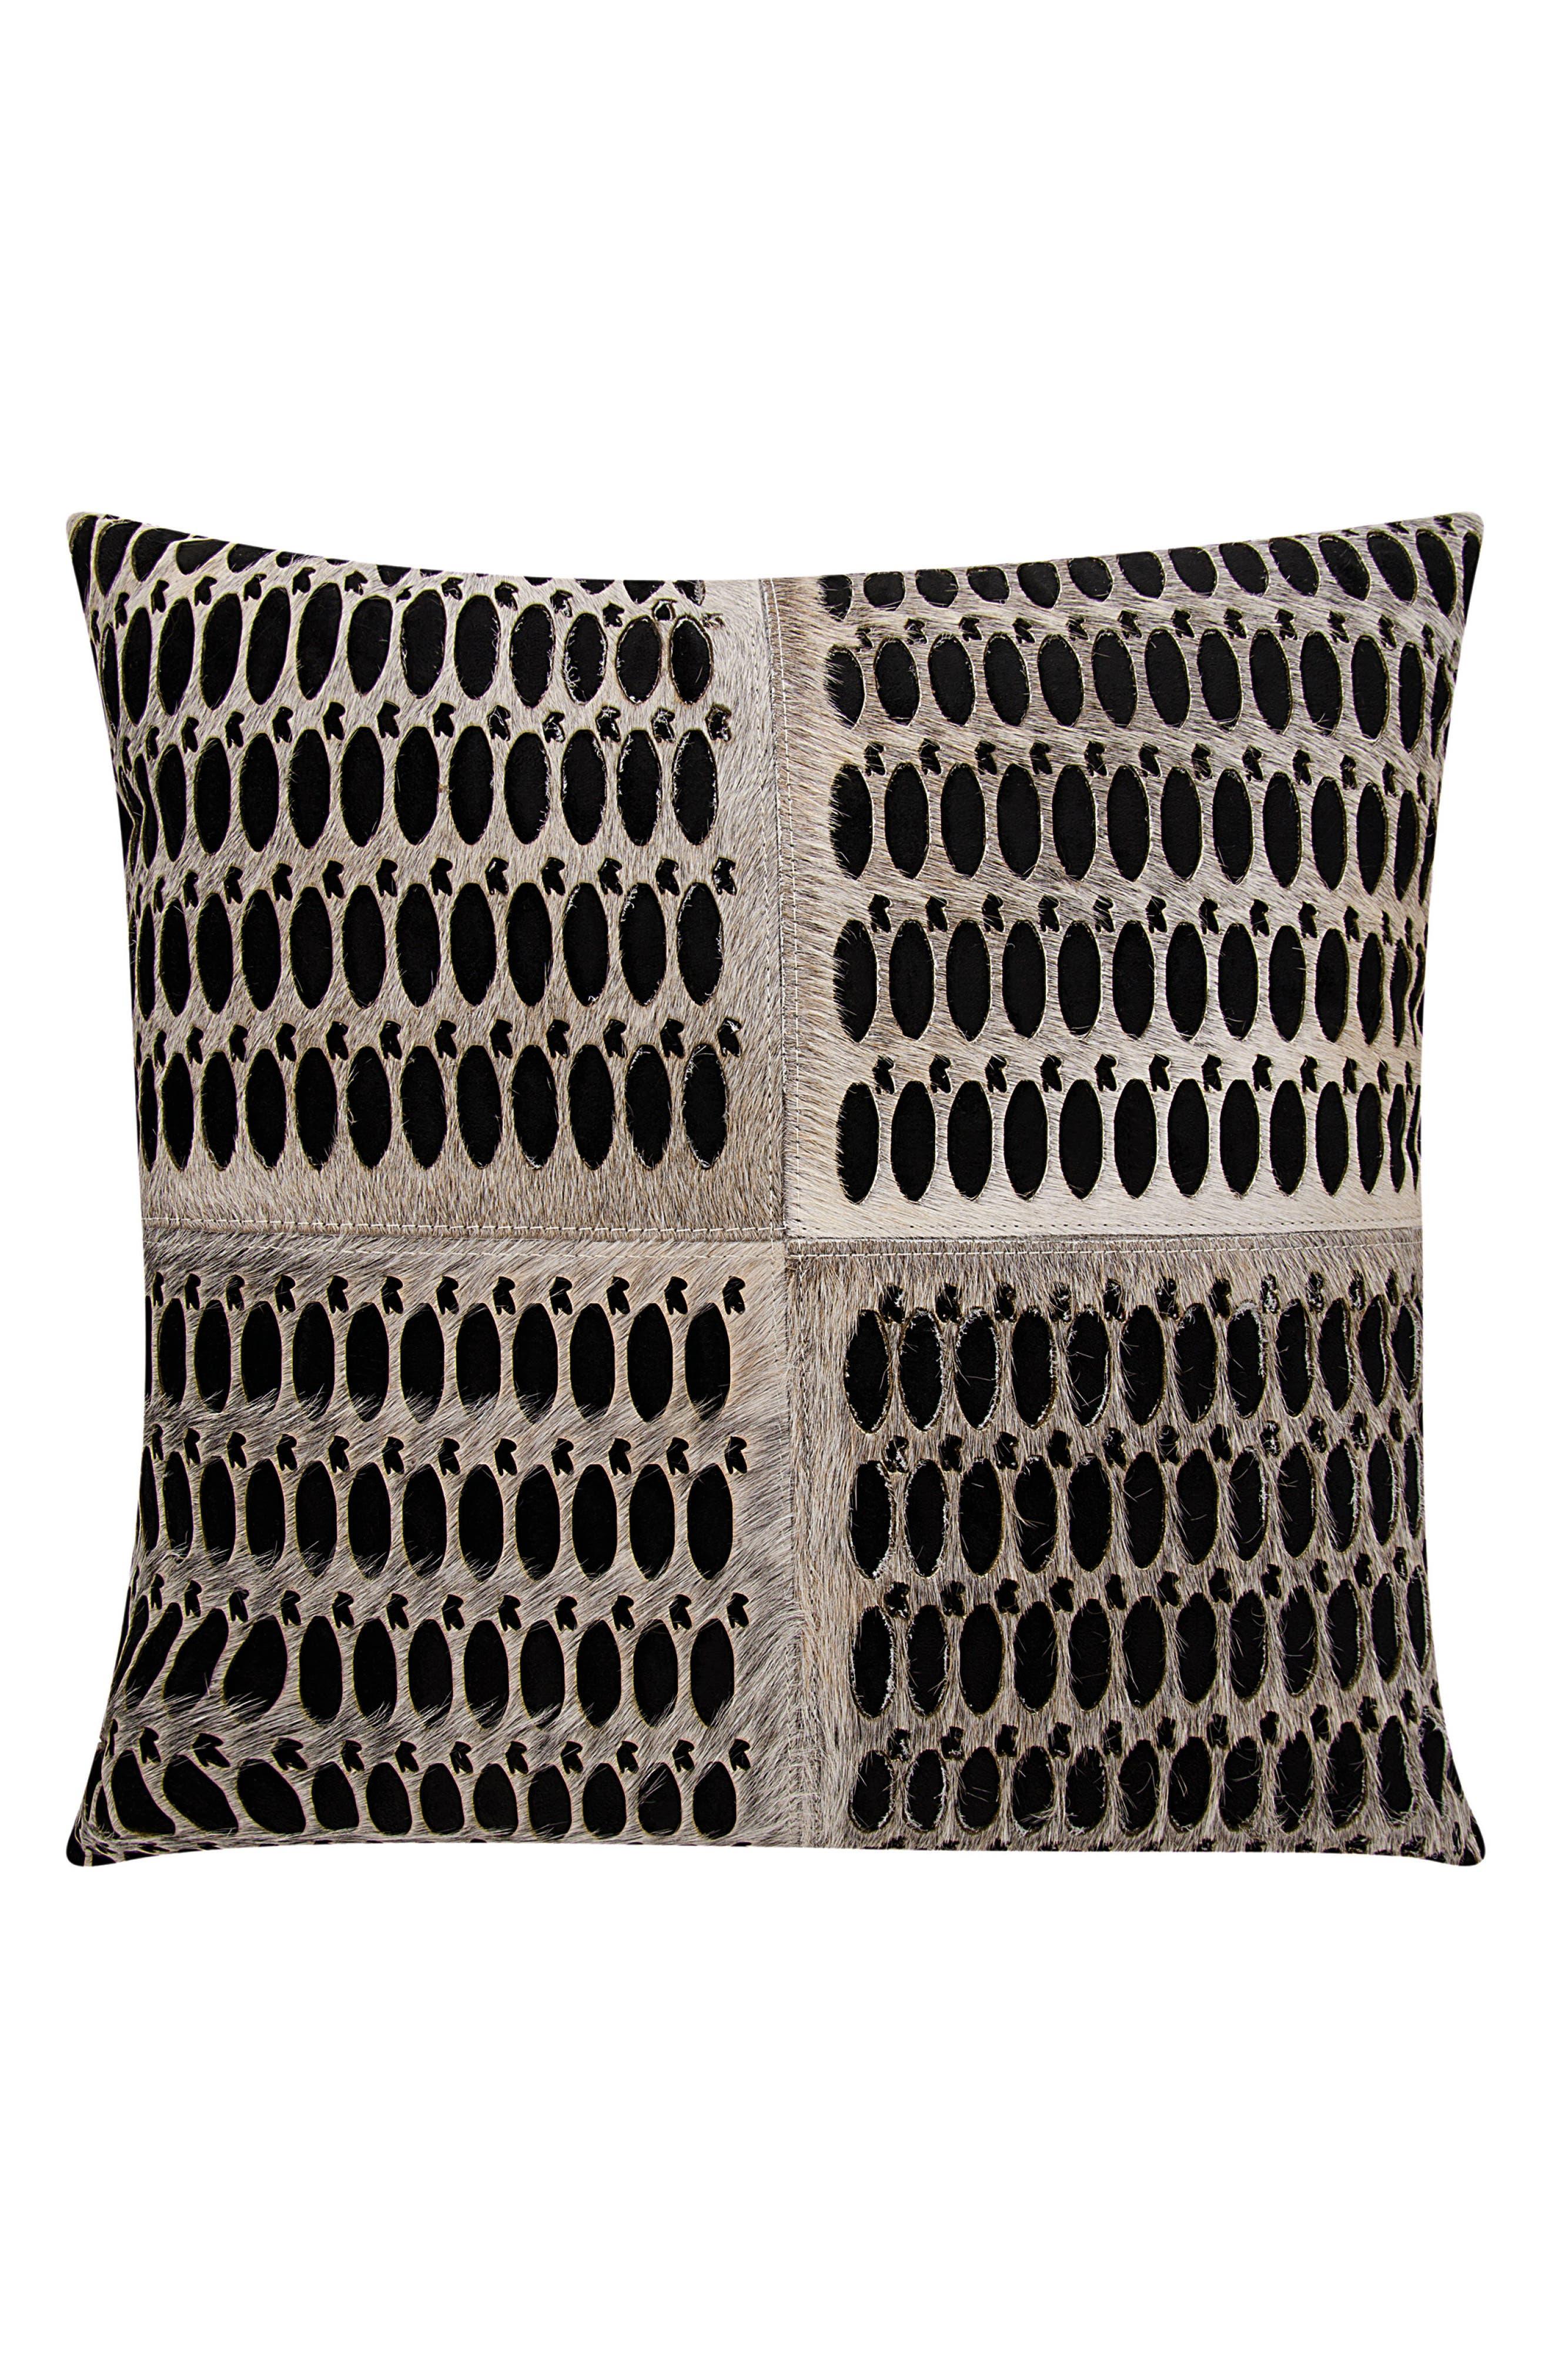 Calf Hair Accent Pillow,                         Main,                         color, 062